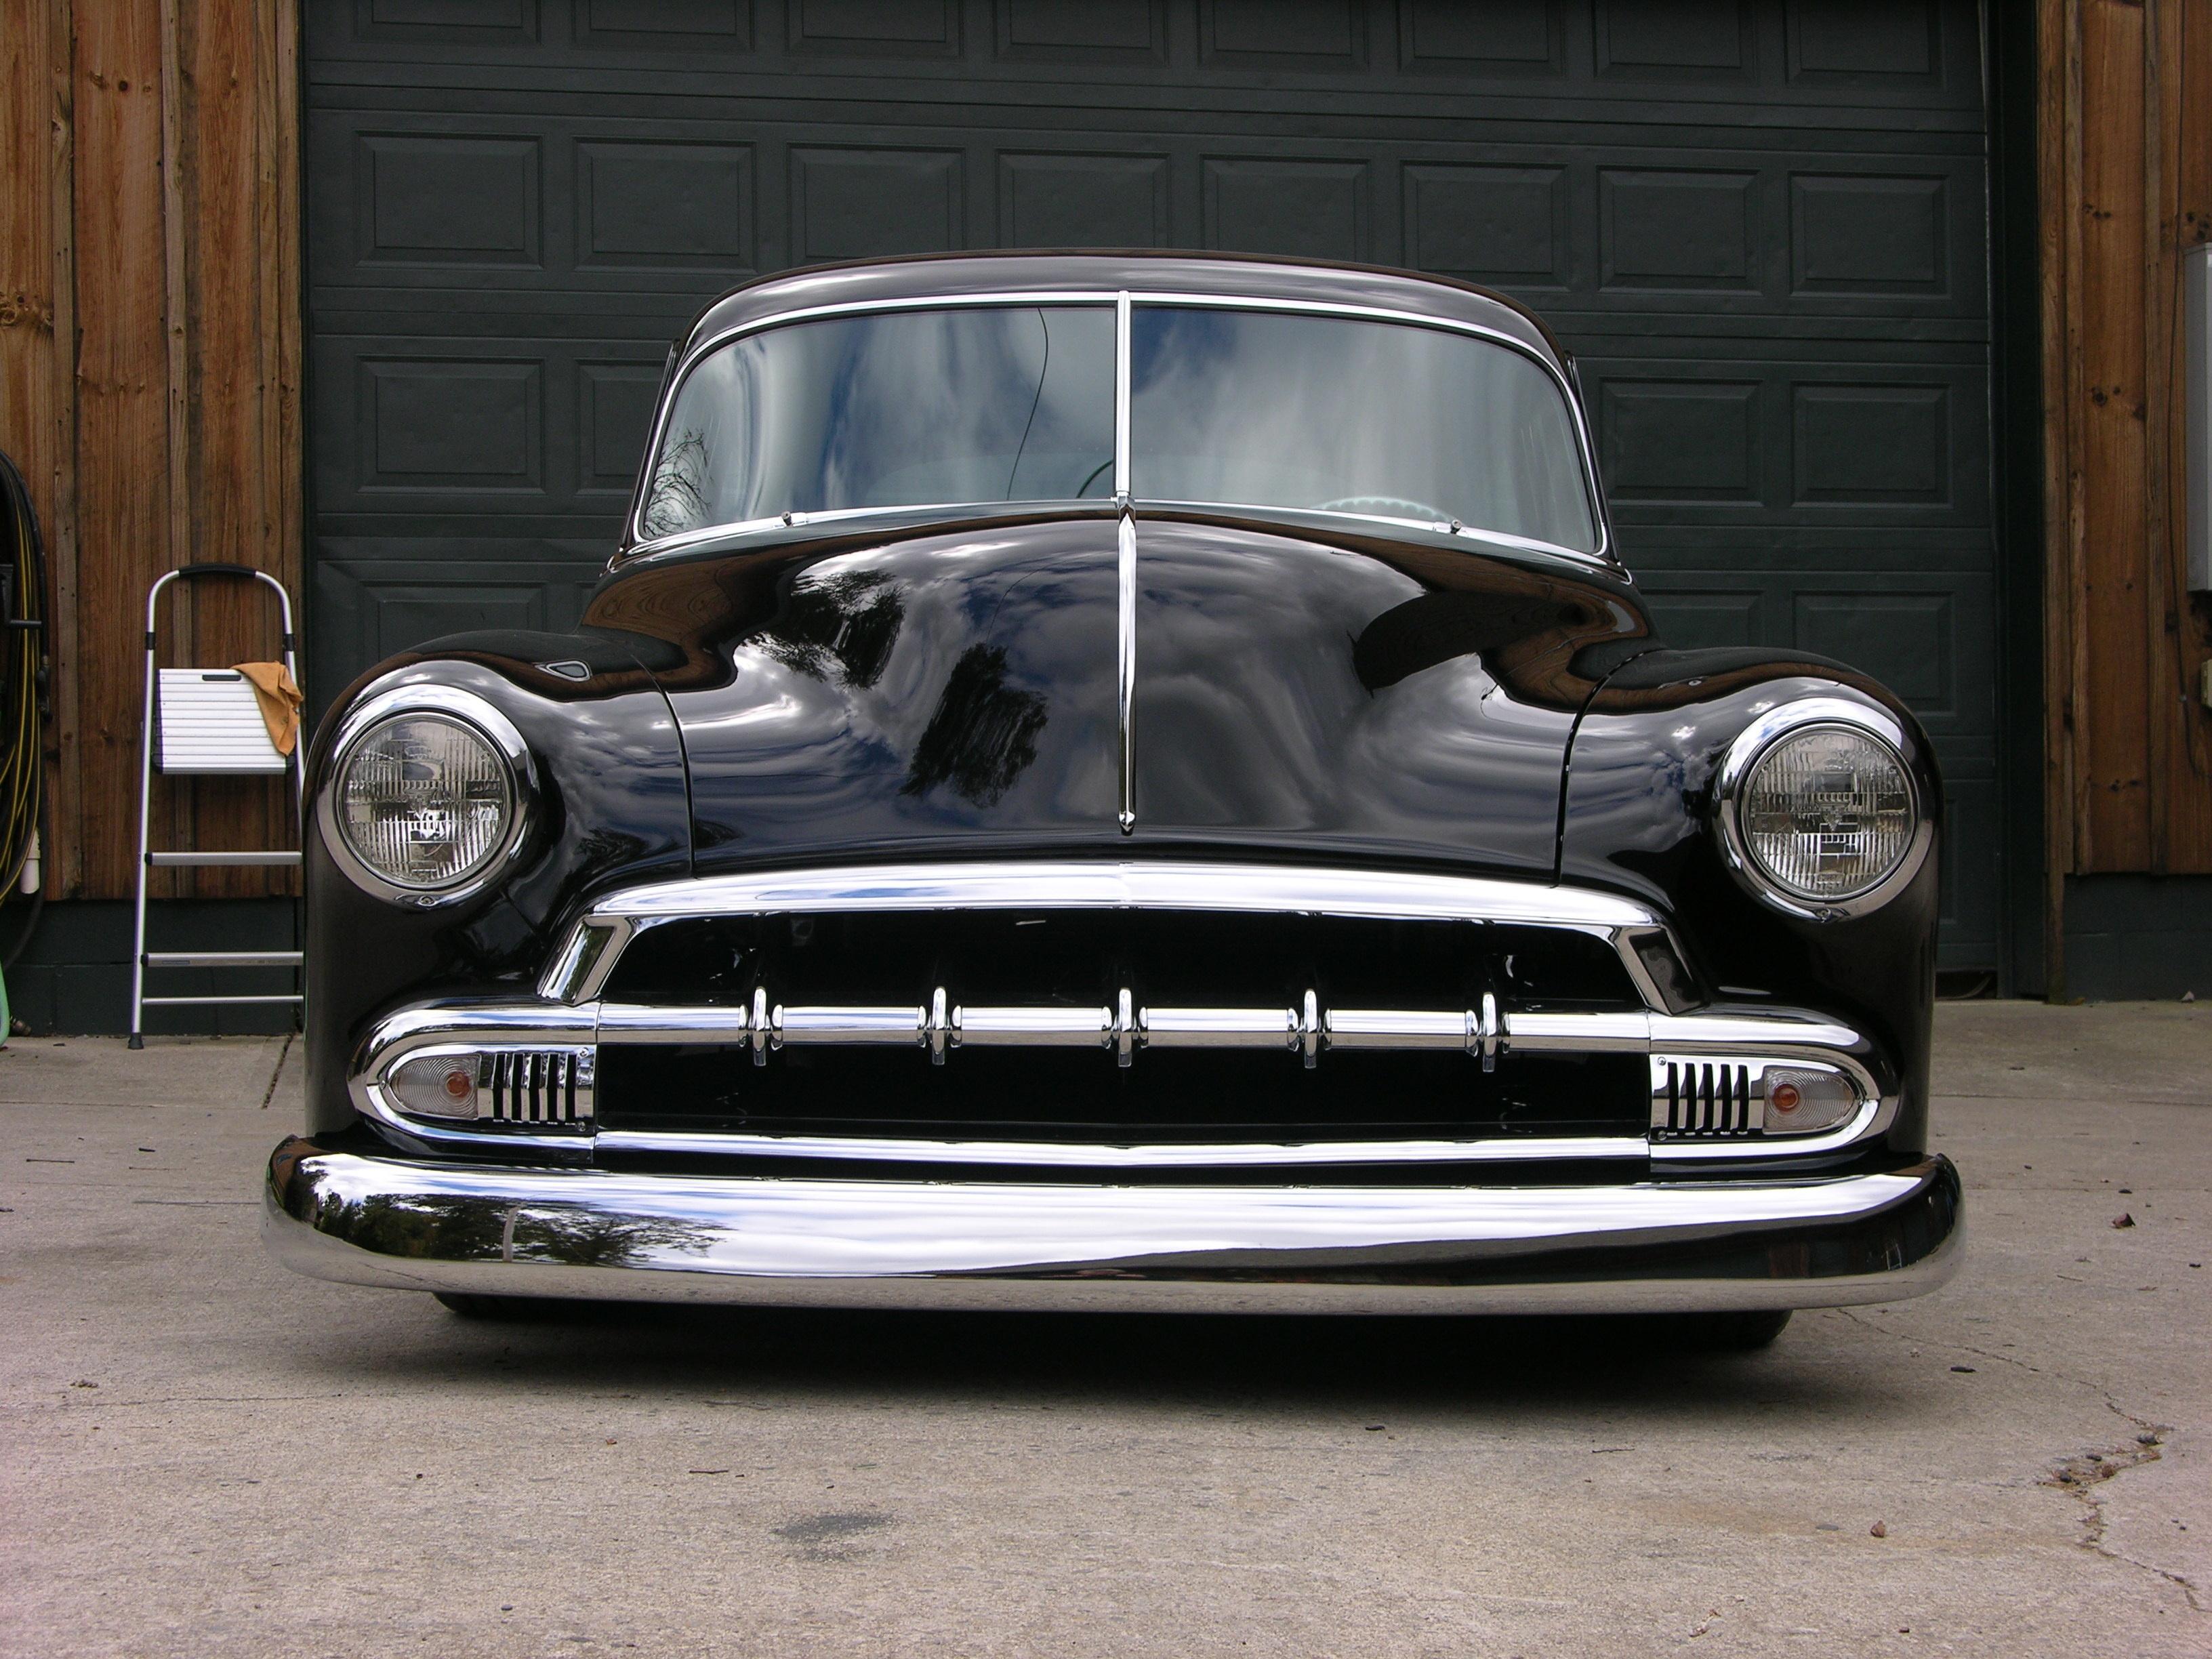 Chevrolet 1951 Hot Rod - HD Wallpaper